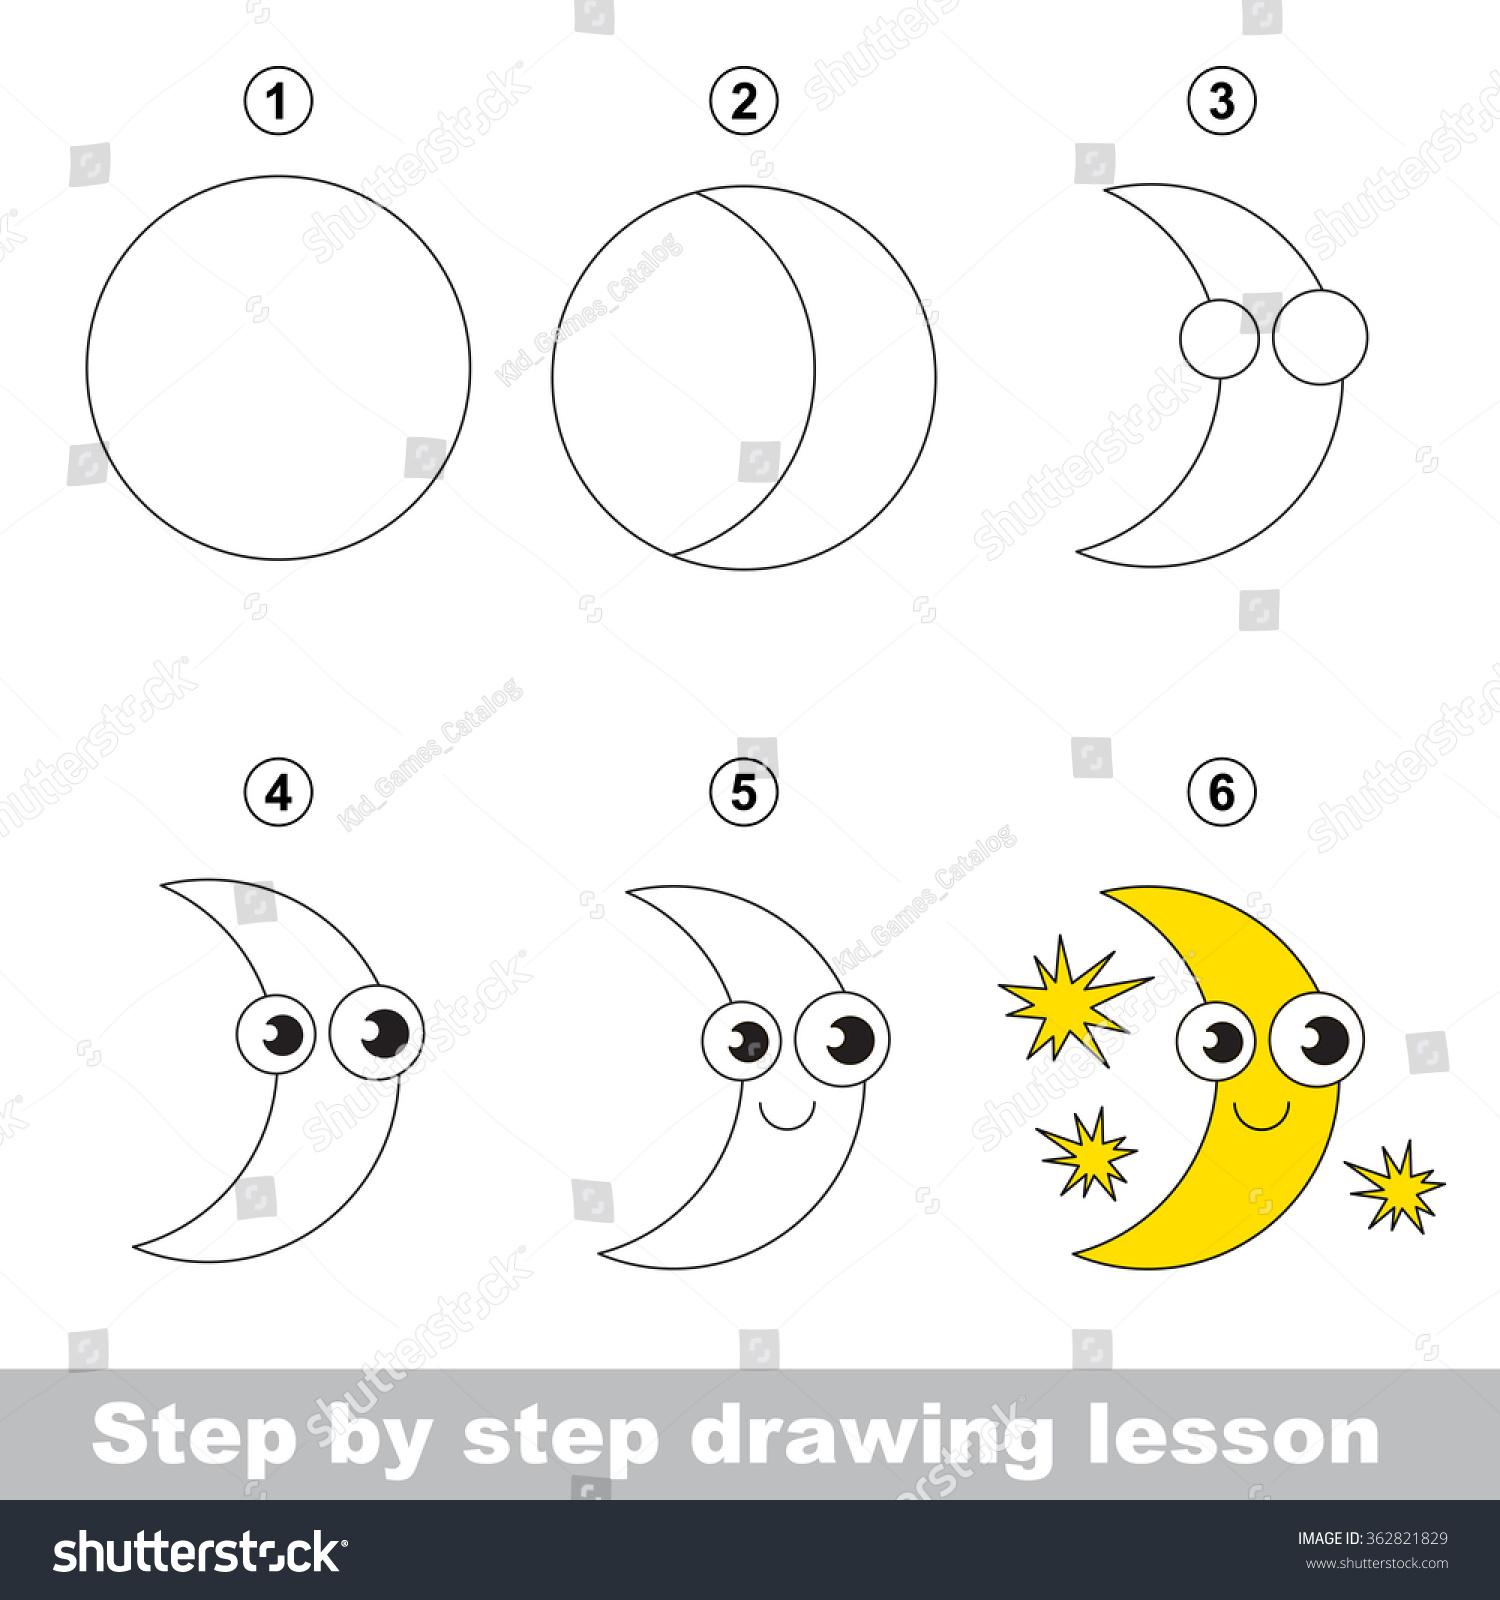 How To Draw A Full Moon F F Xyz 2019